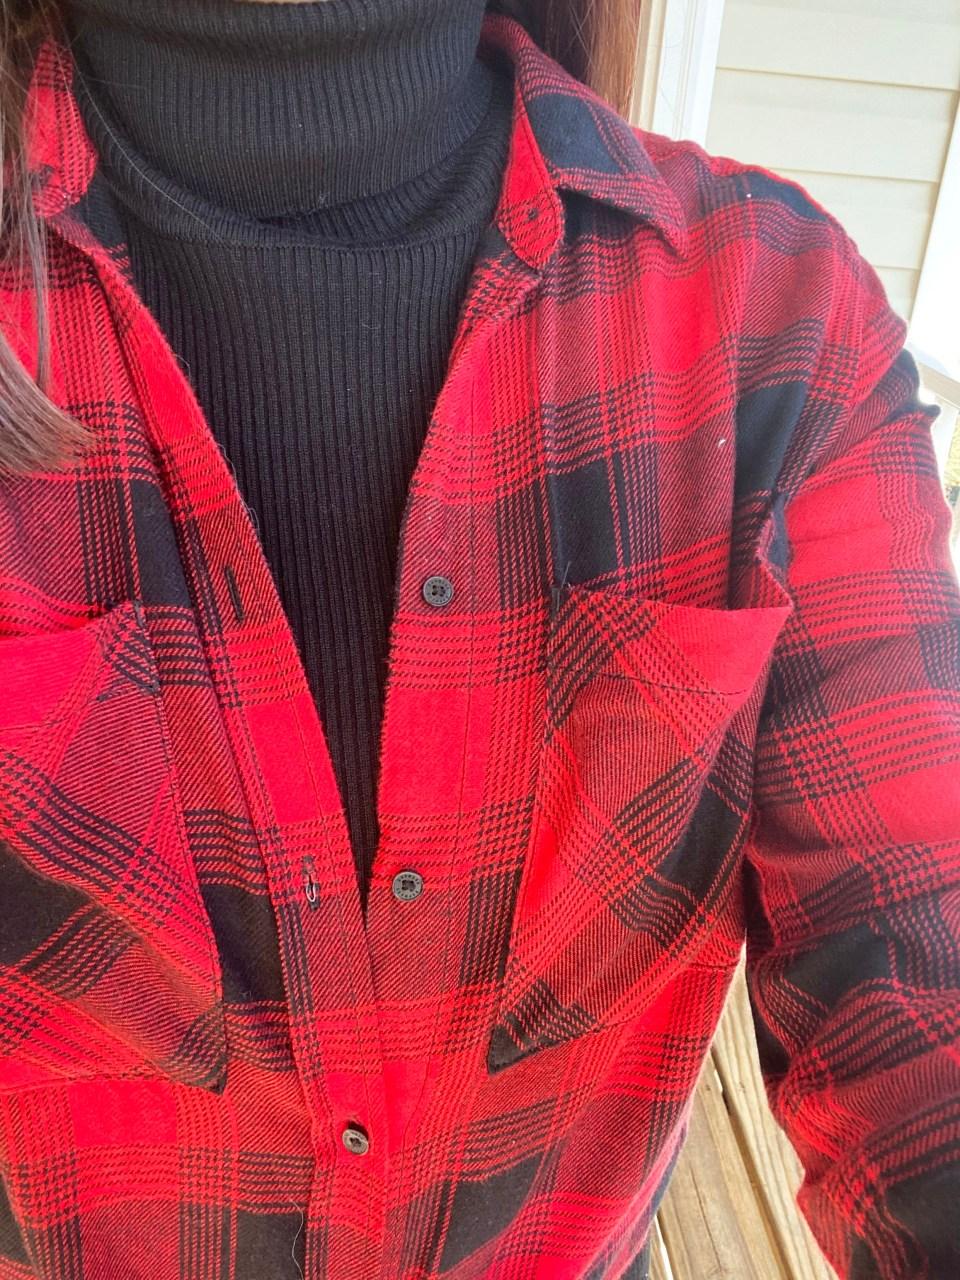 Turtleneck Ribbed Dress + Plaid Shirt 11